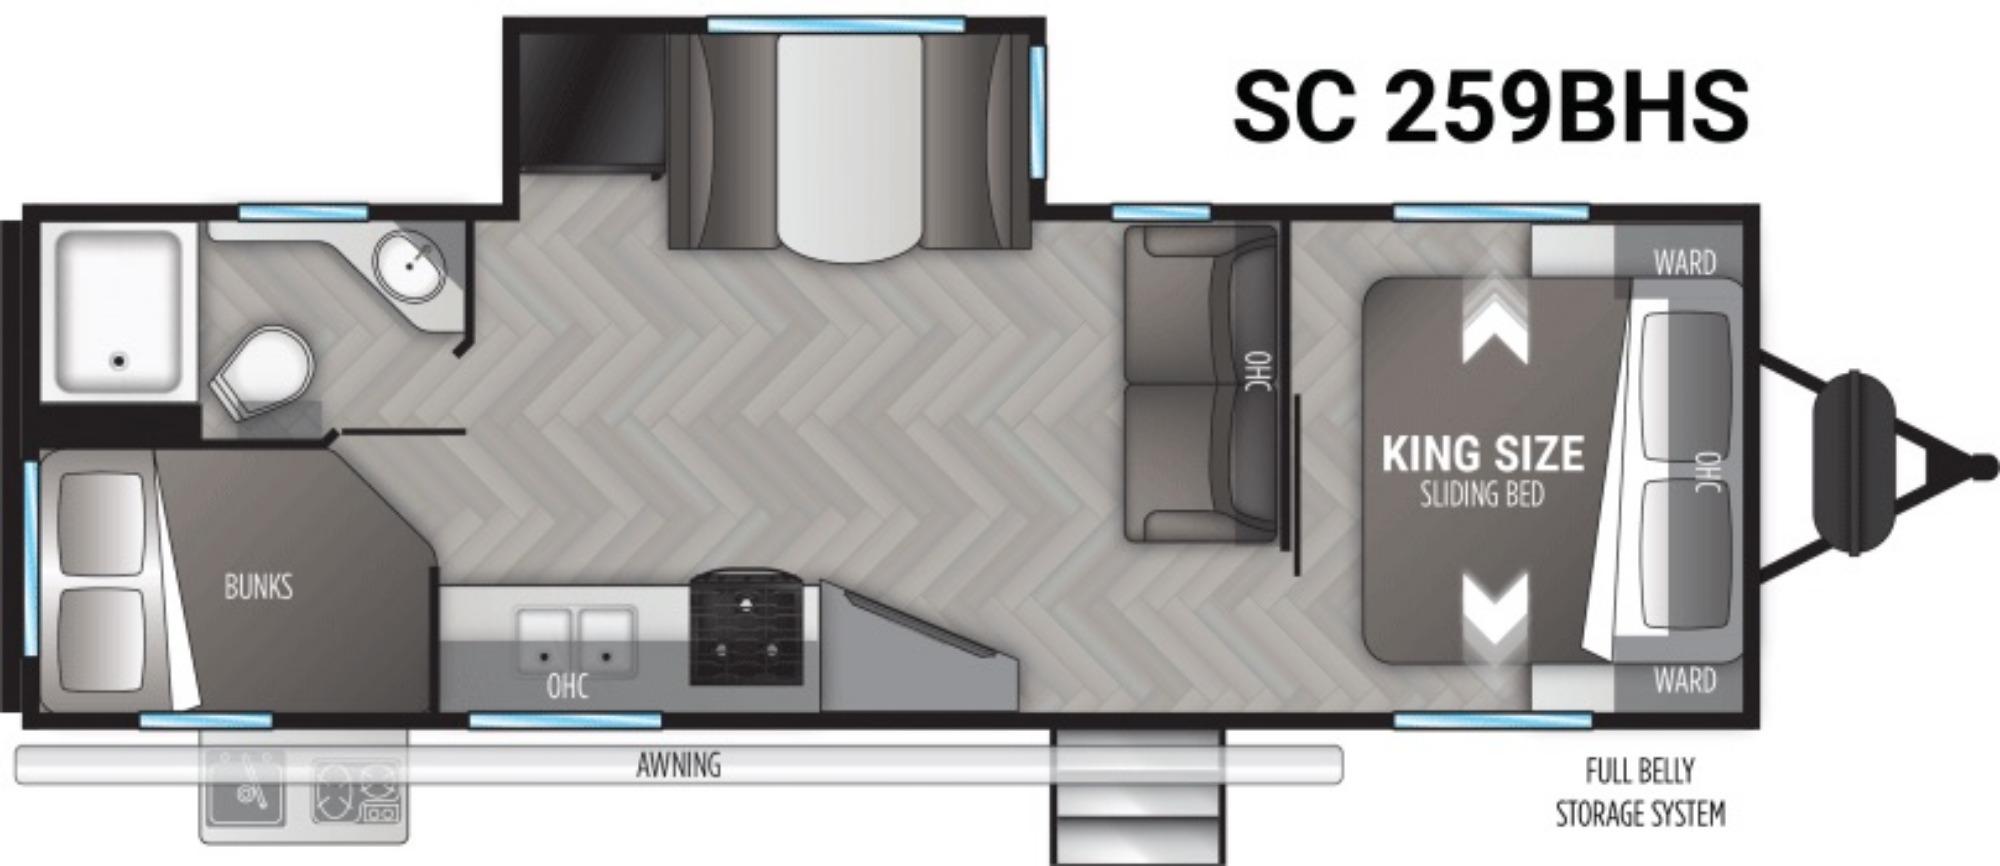 View Floor Plan for 2021 CRUISER RV SHADOW CRUISER ID259BHS